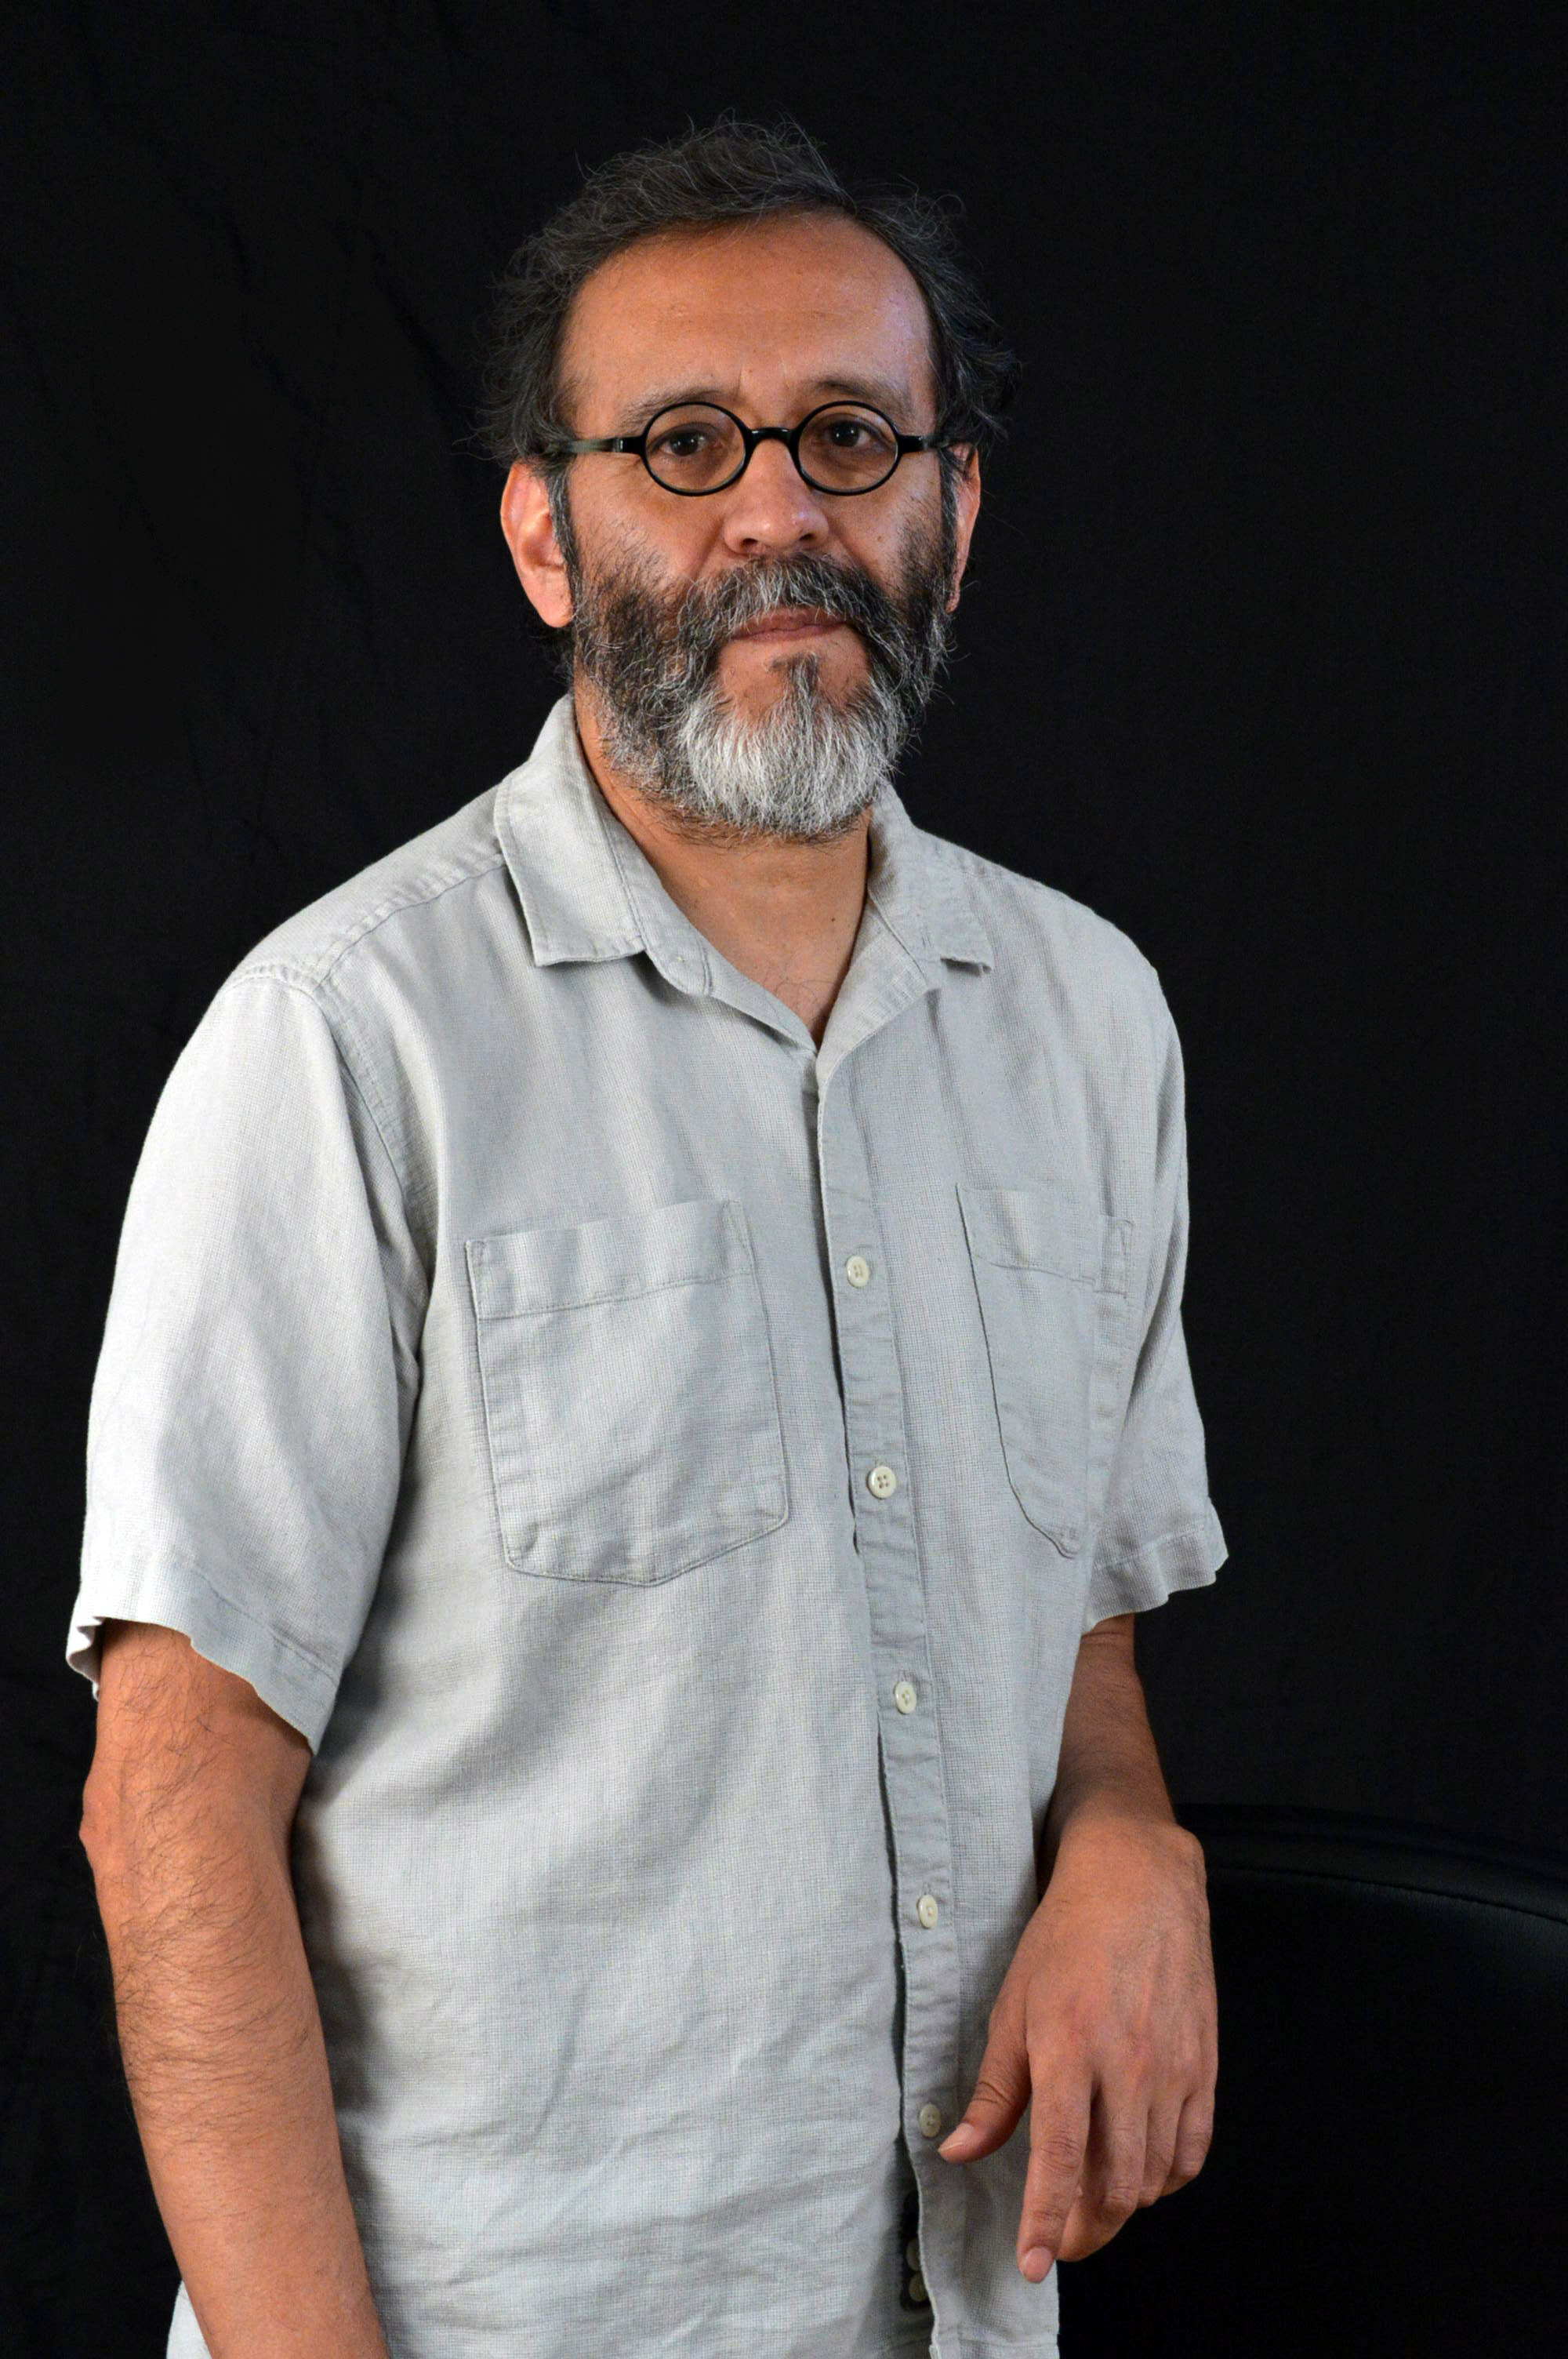 Dr. Rodríguez González Alfredo Odón Image